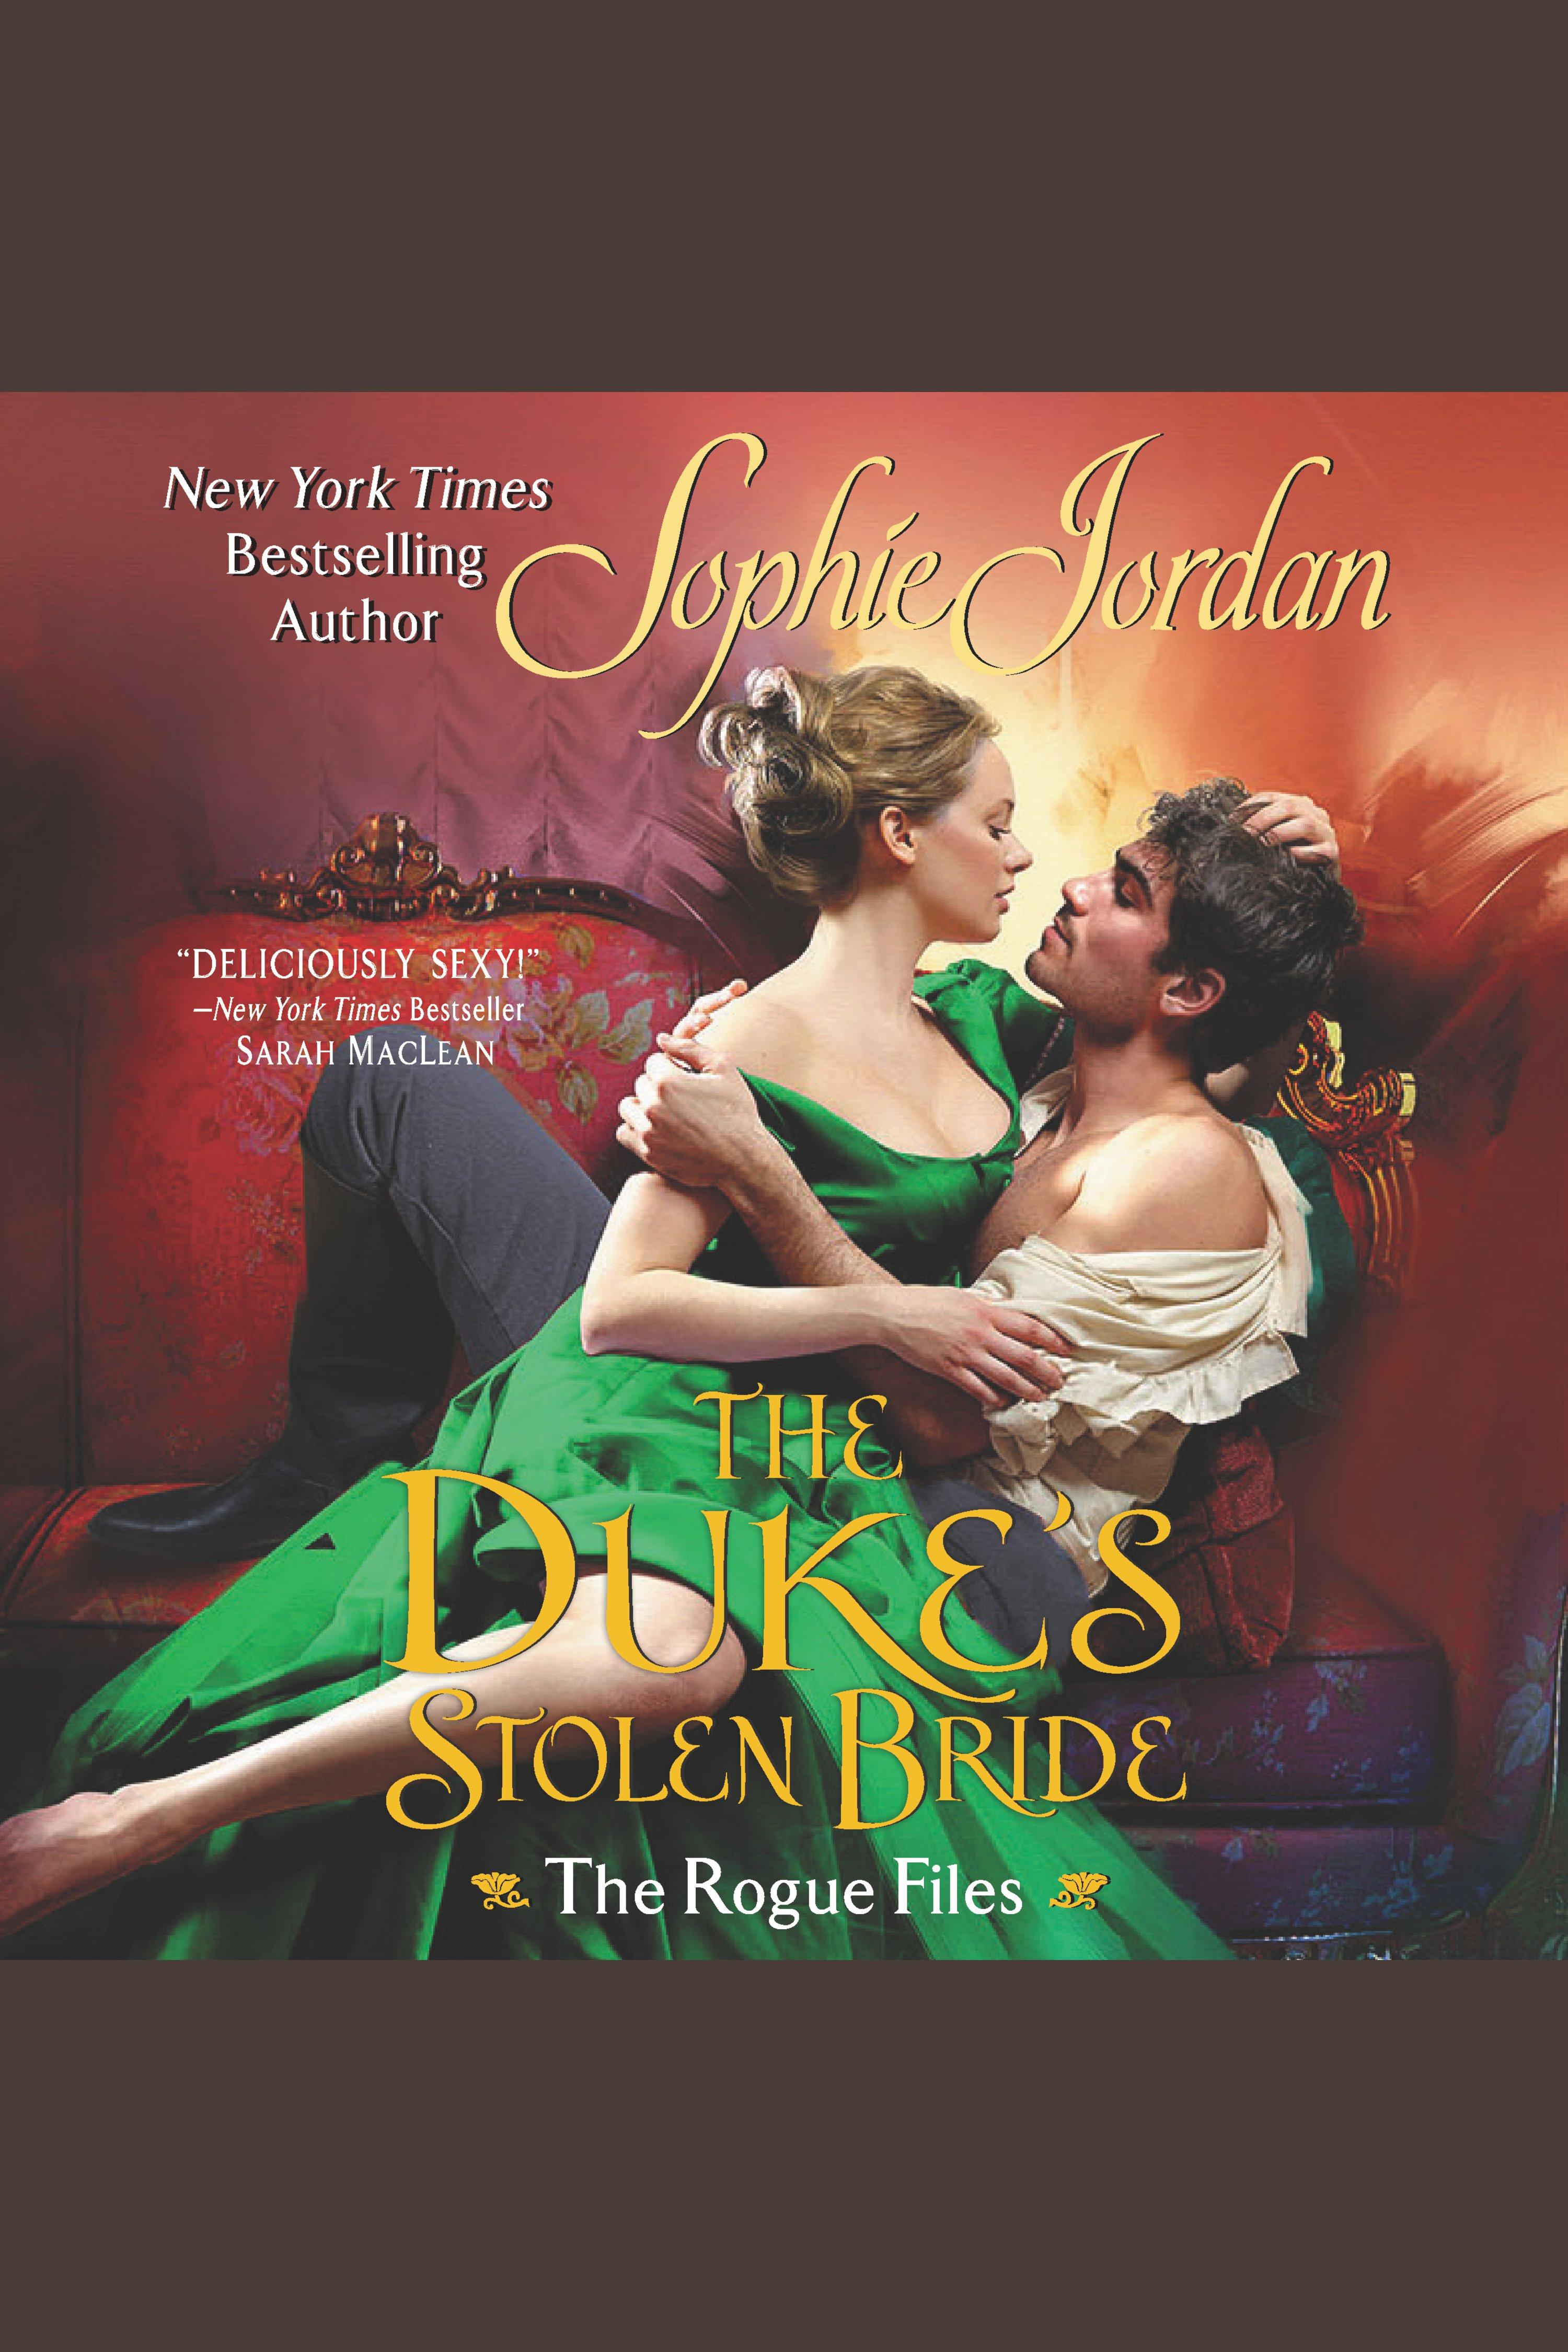 Duke's Stolen Bride, The The Rogue Files, Book 5